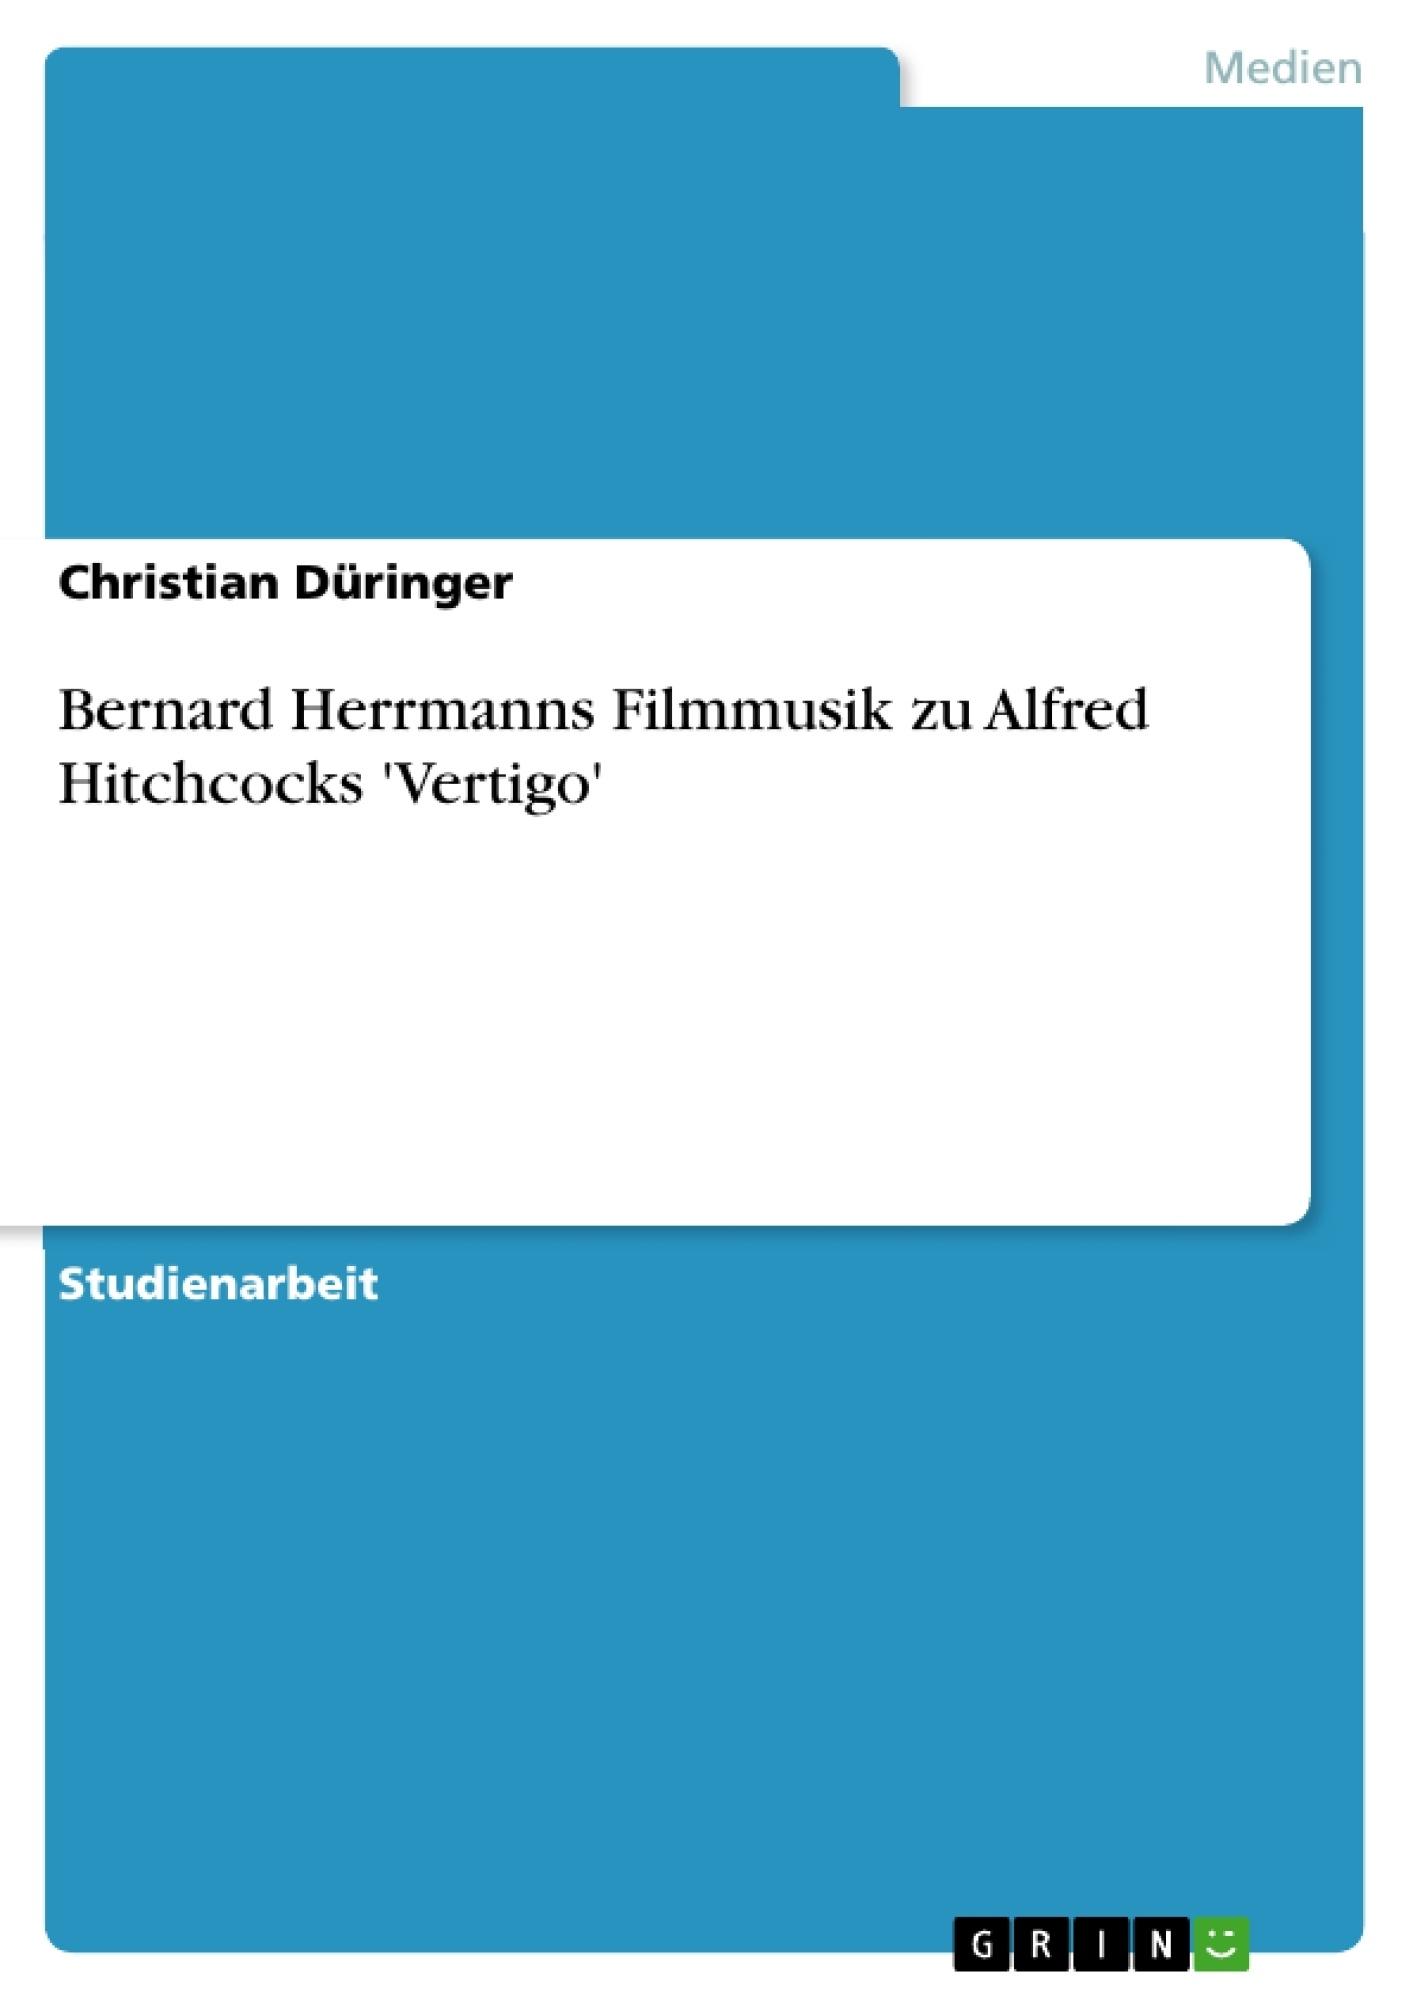 Titel: Bernard Herrmanns Filmmusik zu Alfred Hitchcocks 'Vertigo'